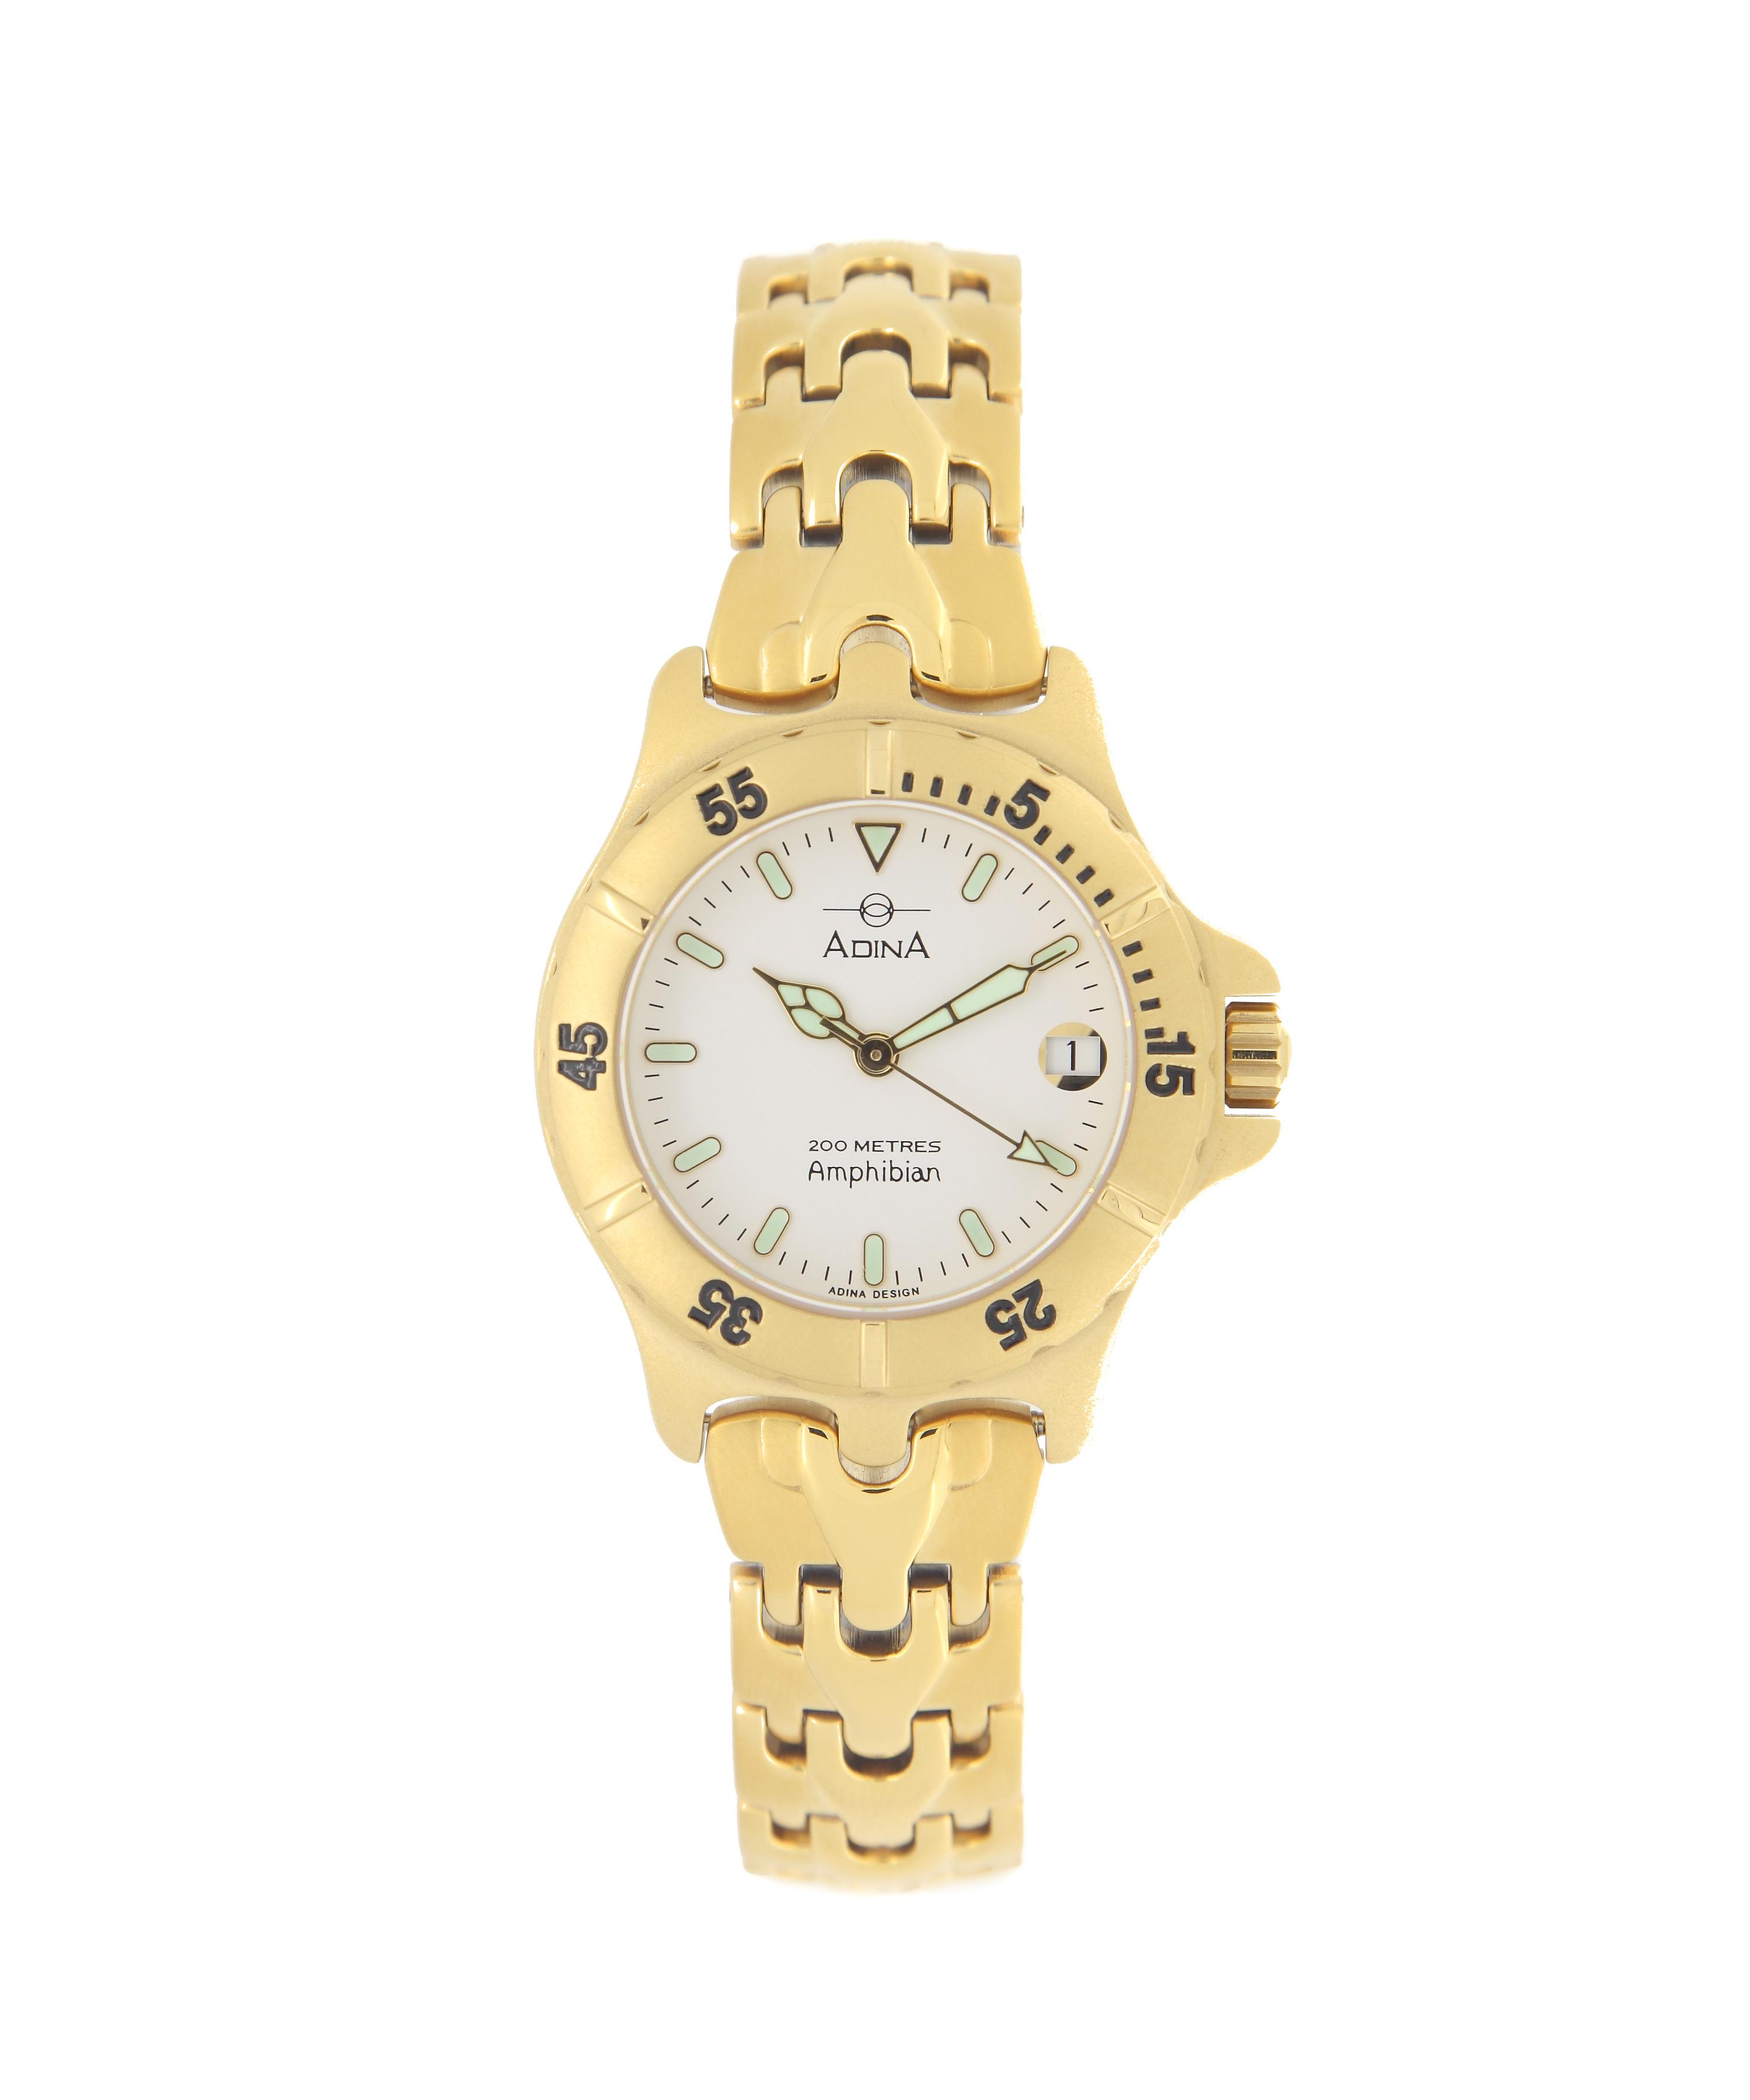 Adina Amphibian Dive Watch CM114 G1XB